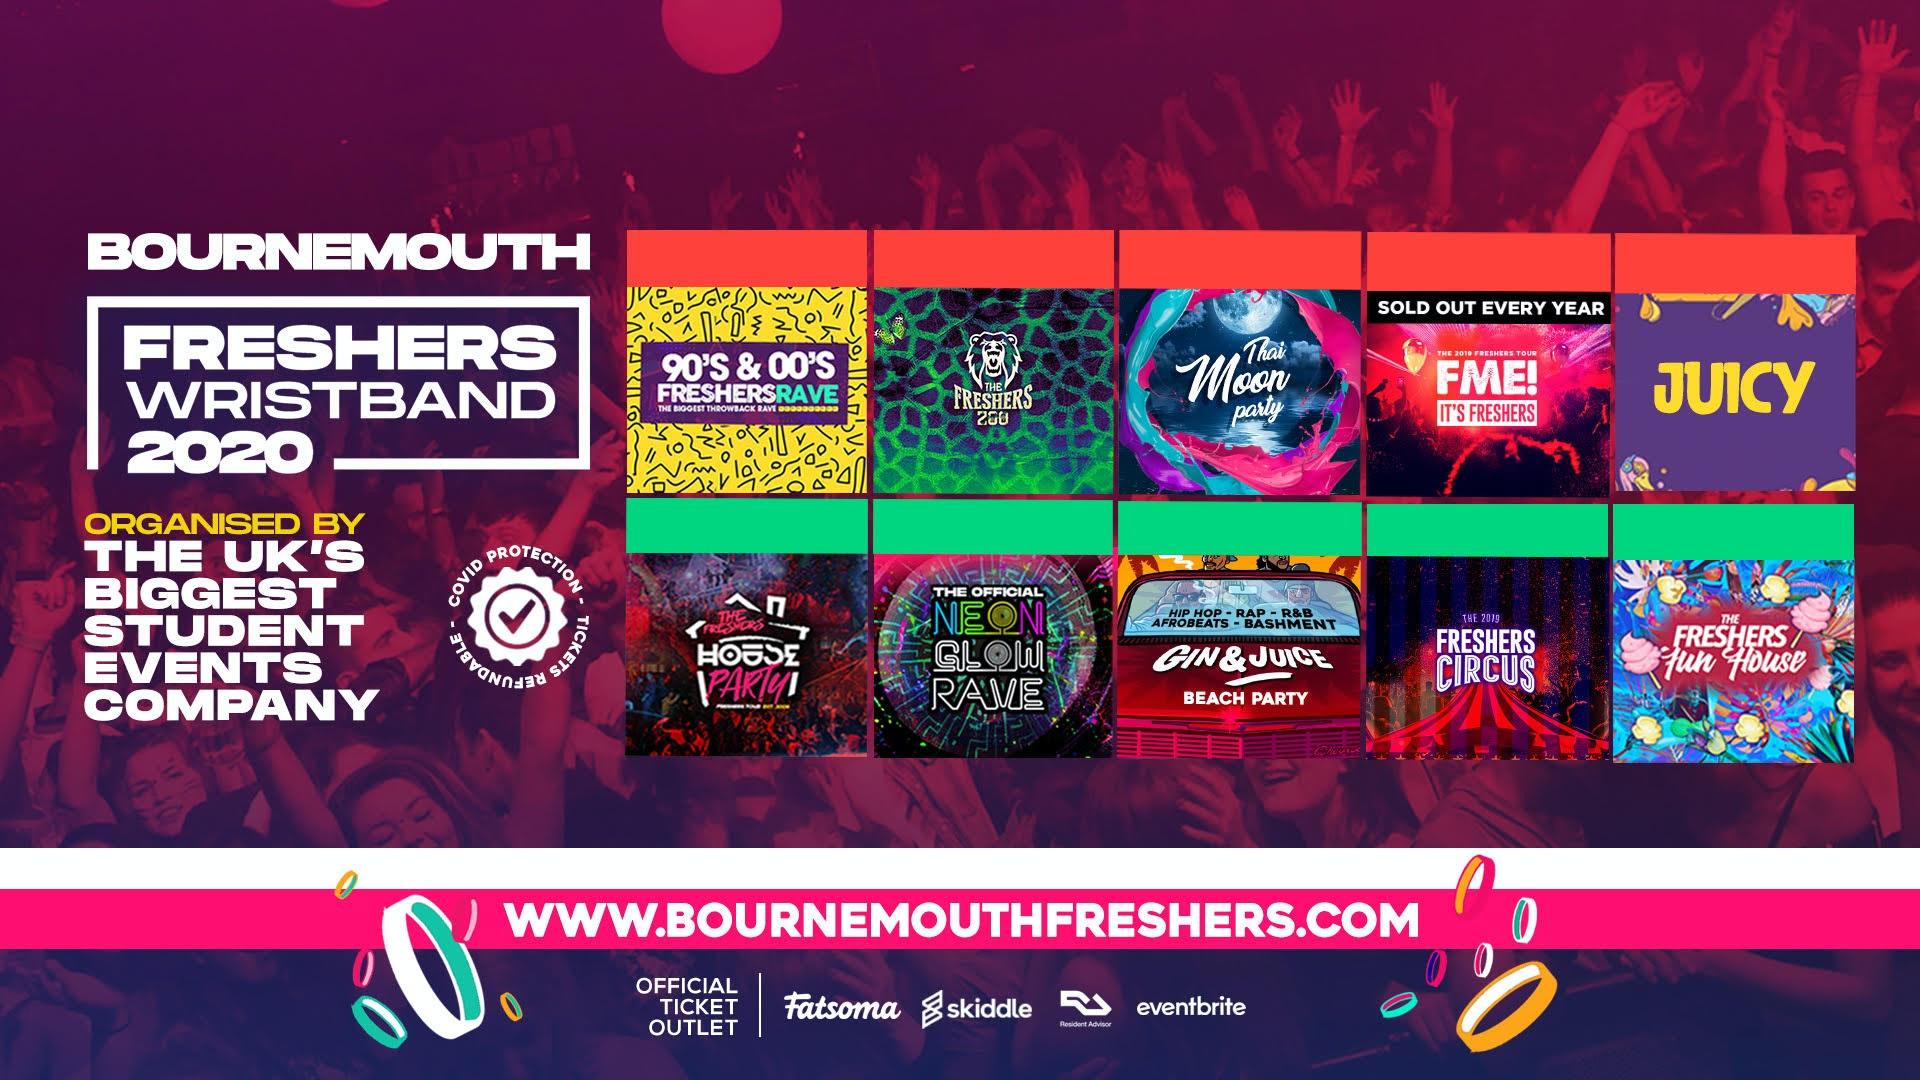 The Bournemouth Freshers Wristband // Bournemouth Freshers 2020